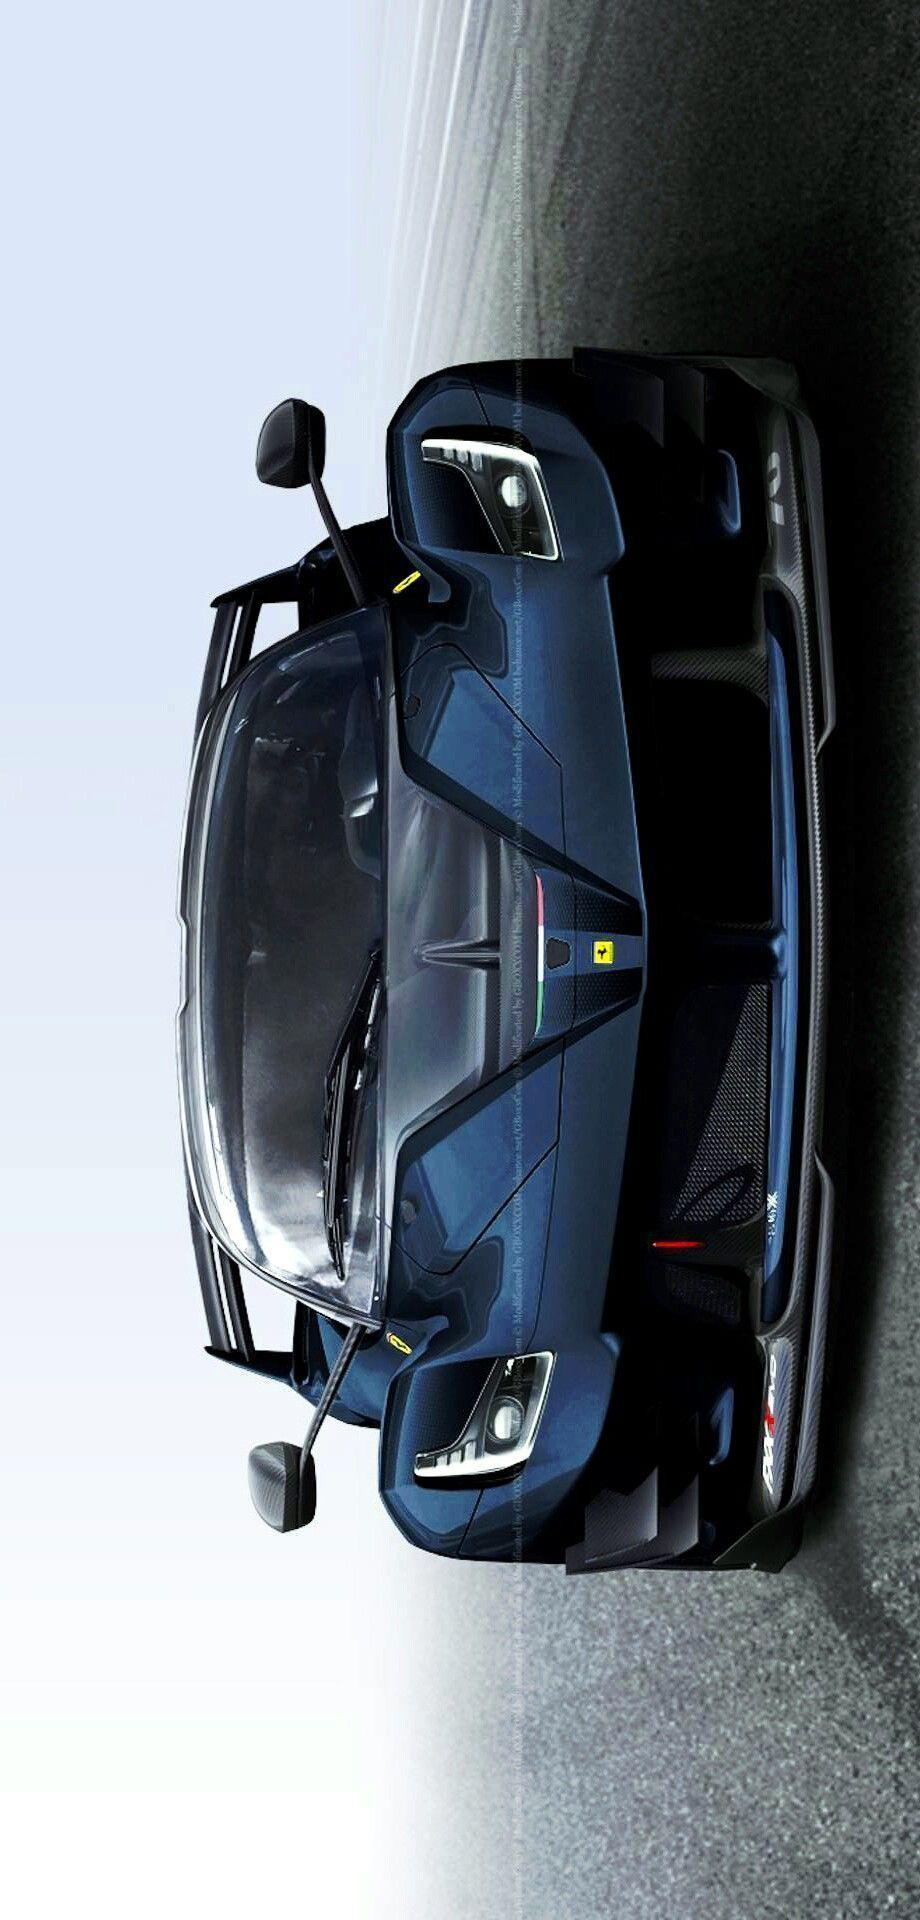 (°!°) Ferrari FXX-K Evo Street Legal concept... #ferrarifxx (°!°) Ferrari FXX-K Evo Street Legal concept... #ferrarifxx (°!°) Ferrari FXX-K Evo Street Legal concept... #ferrarifxx (°!°) Ferrari FXX-K Evo Street Legal concept... #ferrarifxx (°!°) Ferrari FXX-K Evo Street Legal concept... #ferrarifxx (°!°) Ferrari FXX-K Evo Street Legal concept... #ferrarifxx (°!°) Ferrari FXX-K Evo Street Legal concept... #ferrarifxx (°!°) Ferrari FXX-K Evo Street Legal concept... #ferrarifxx (� #ferrarifxx